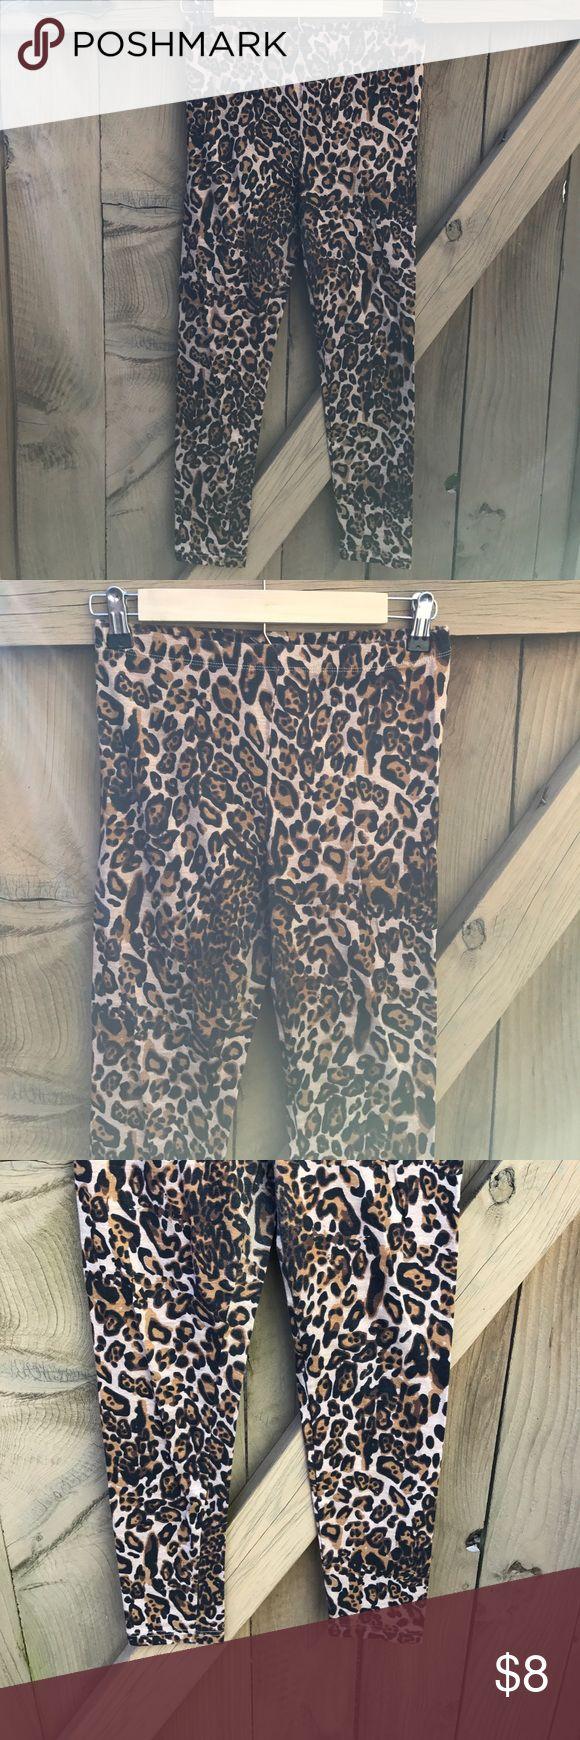 Size M Rue 21 cheetah print leggings Size M Rue 21 cheetah print leggings Rue 21 Pants Leggings